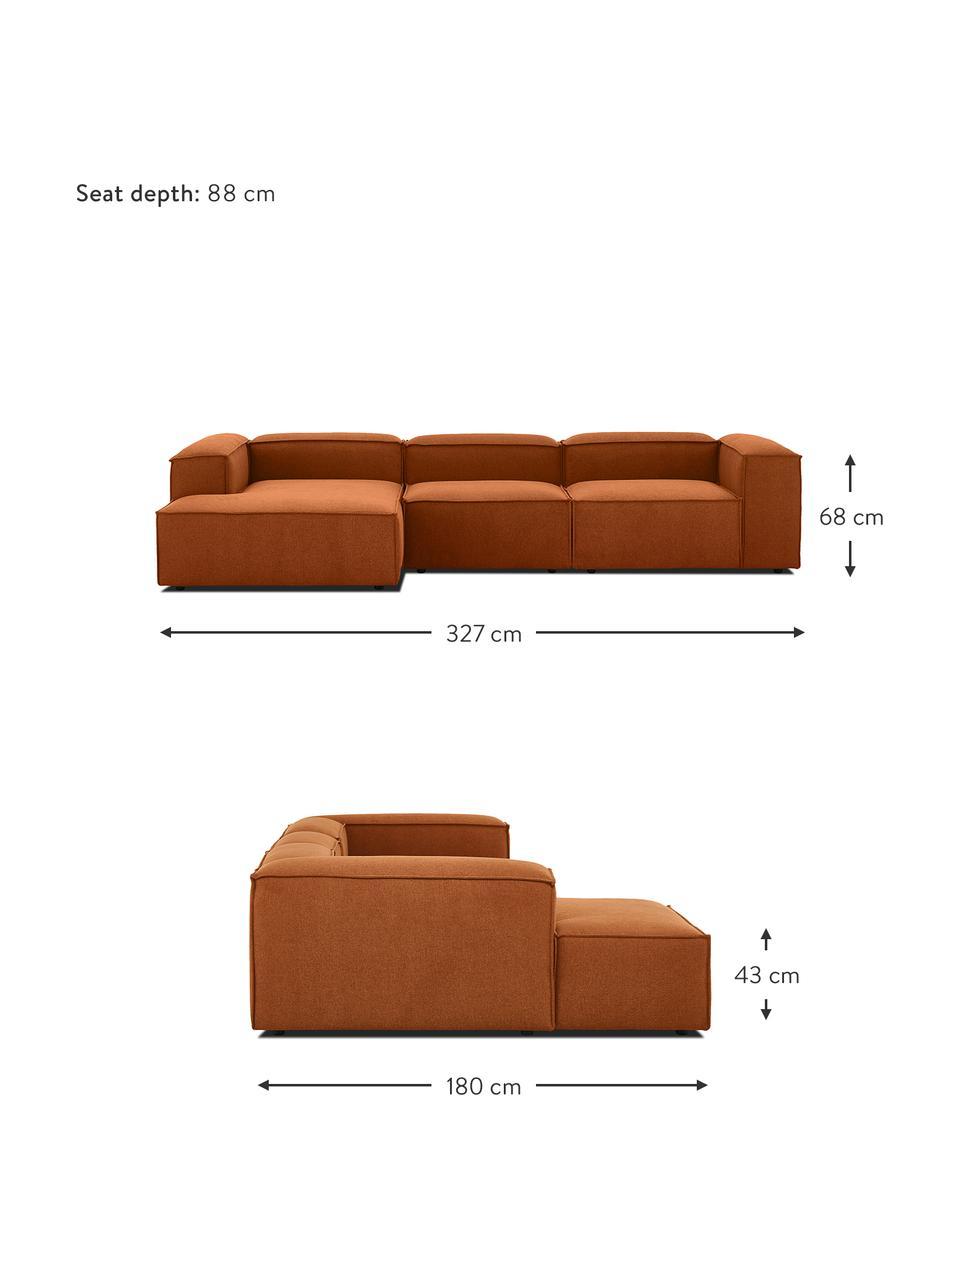 Canapé d'angle modulable terracotta Lennon, Tissu terracotta